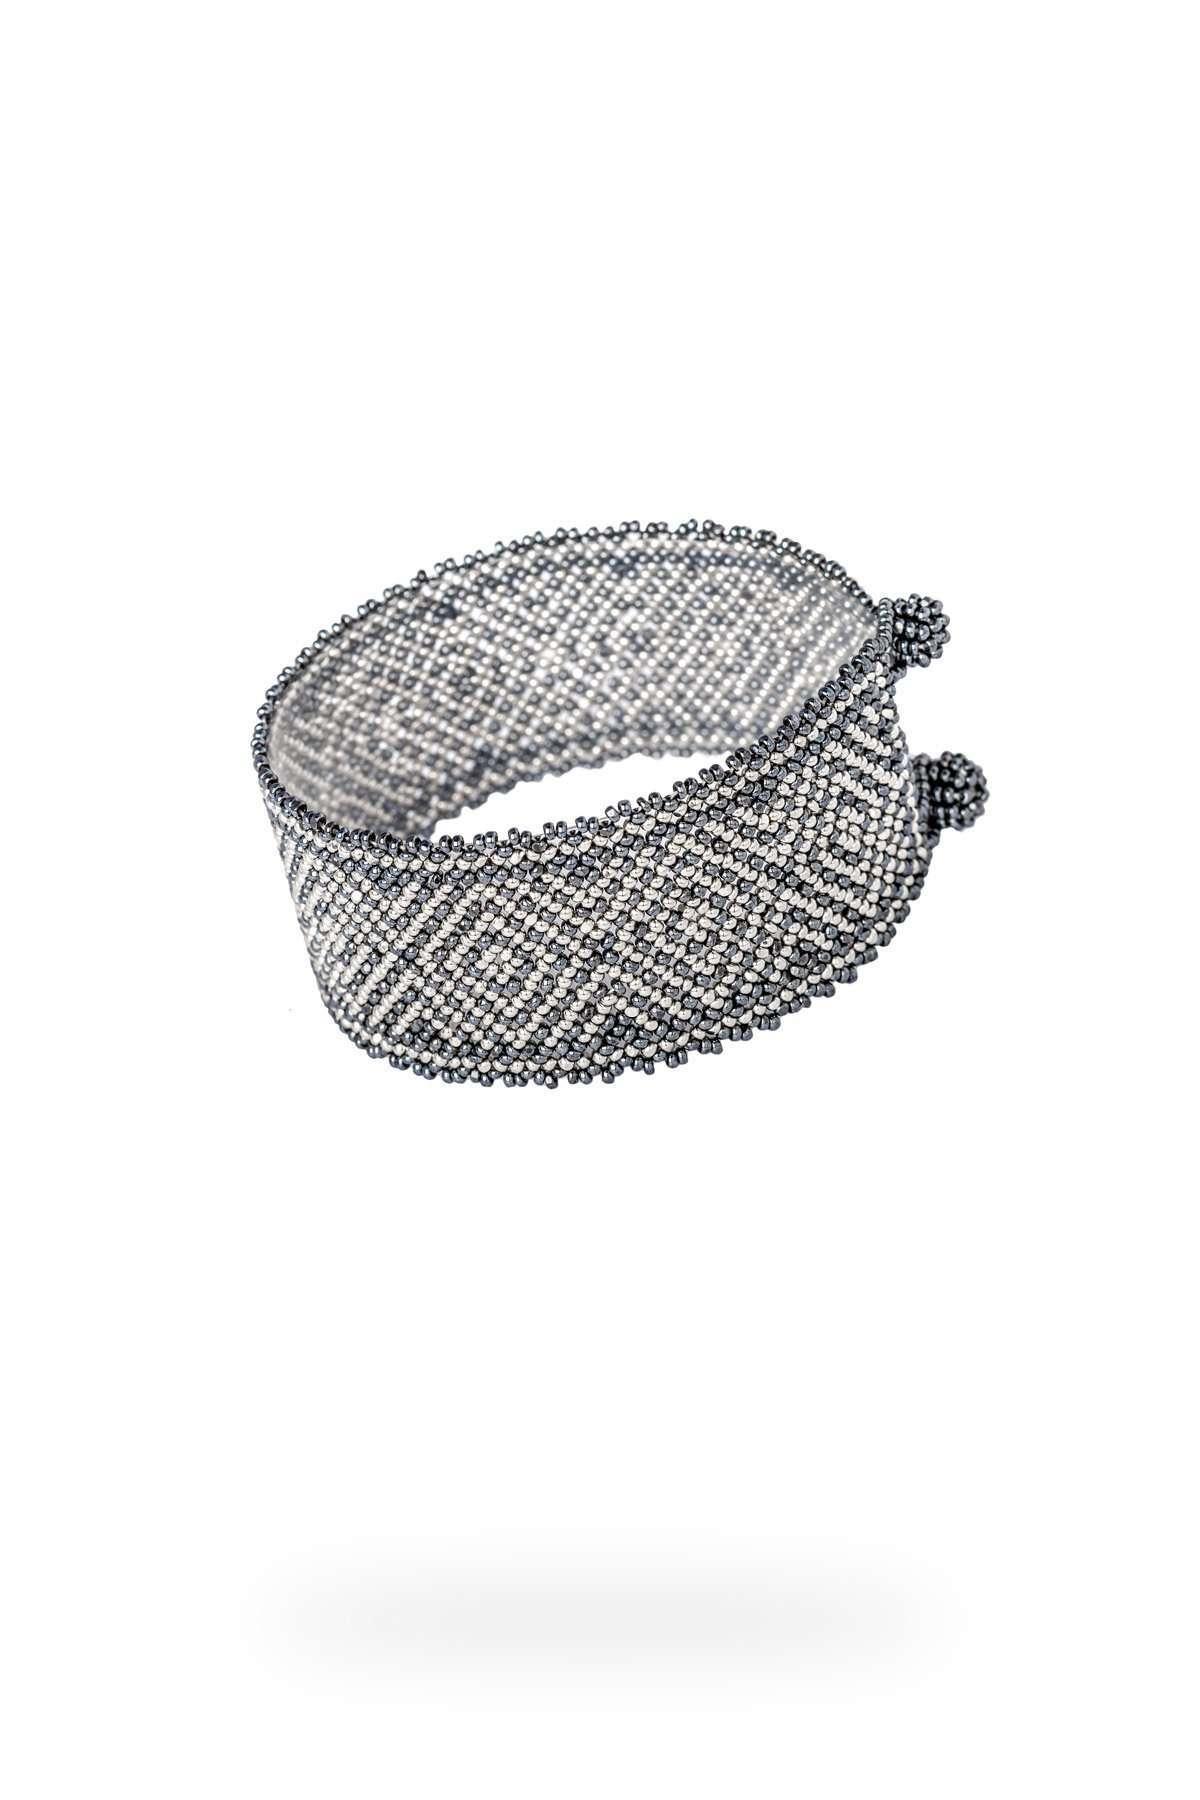 013 brazaletes mediano platino gris